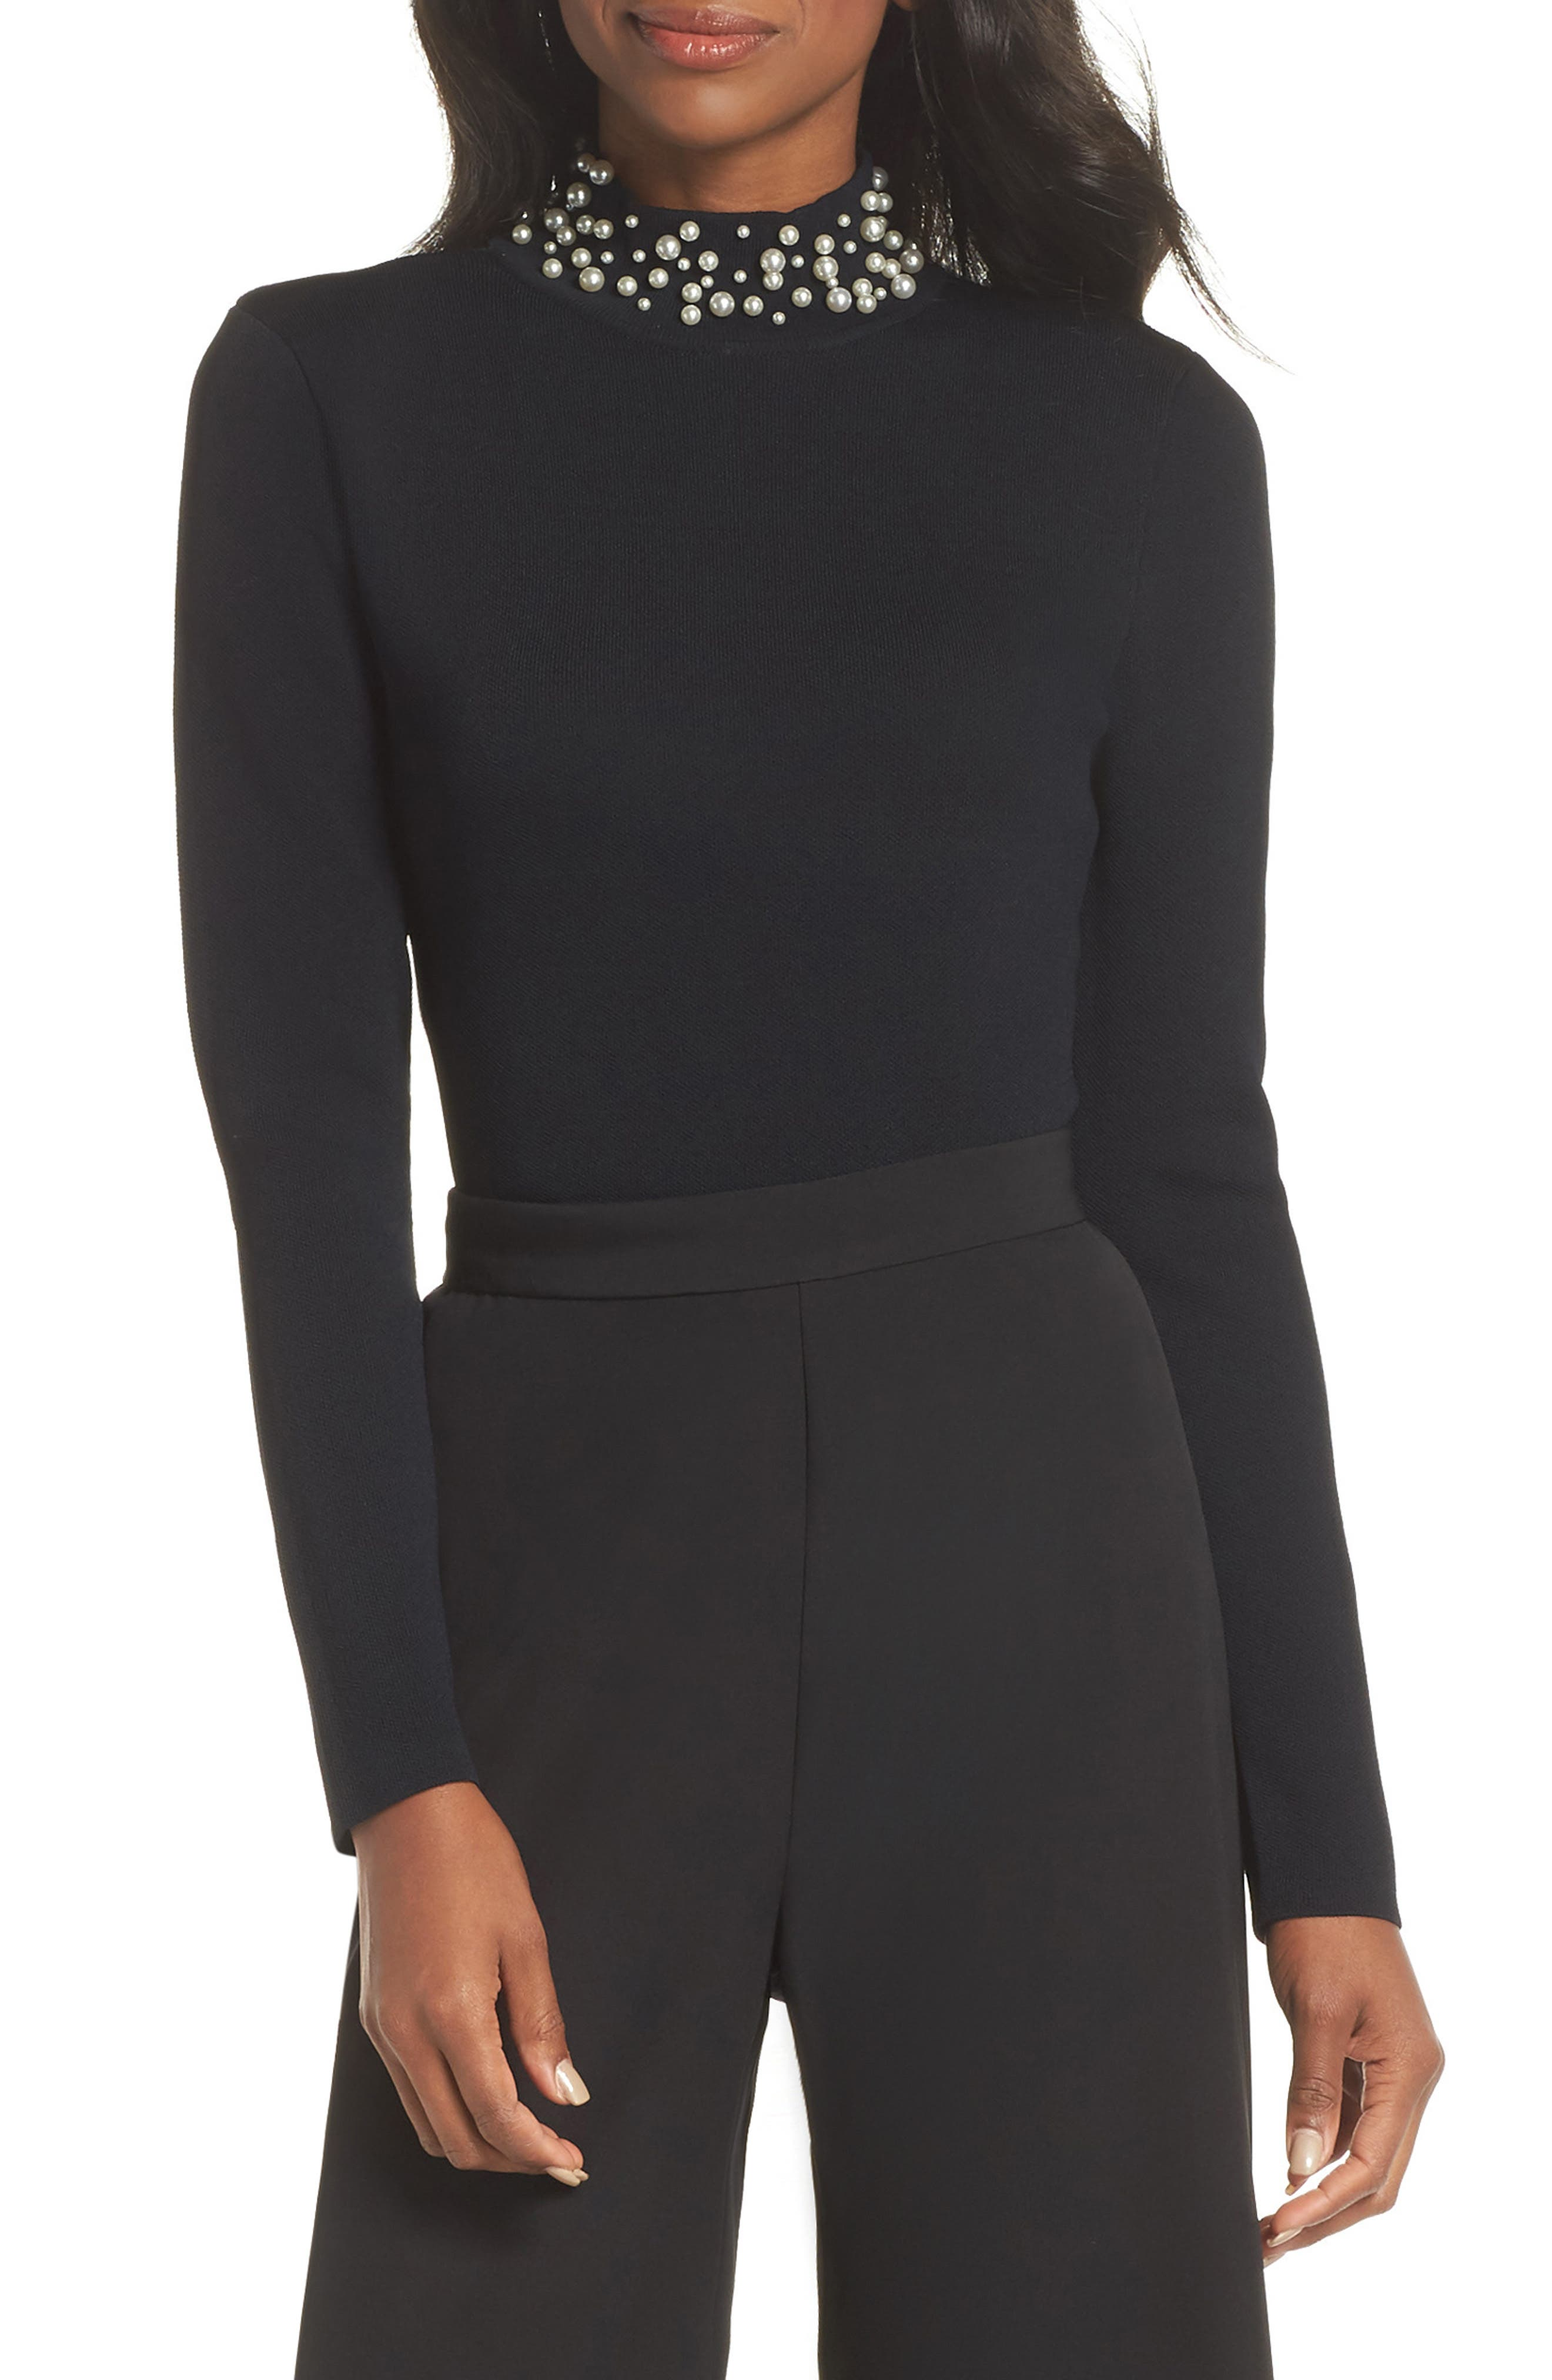 1950s Rockabilly & Pin Up Tops, Blouses, Shirts Womens Eliza J Faux Pearl Embellished Mock Neck Sweater $76.80 AT vintagedancer.com